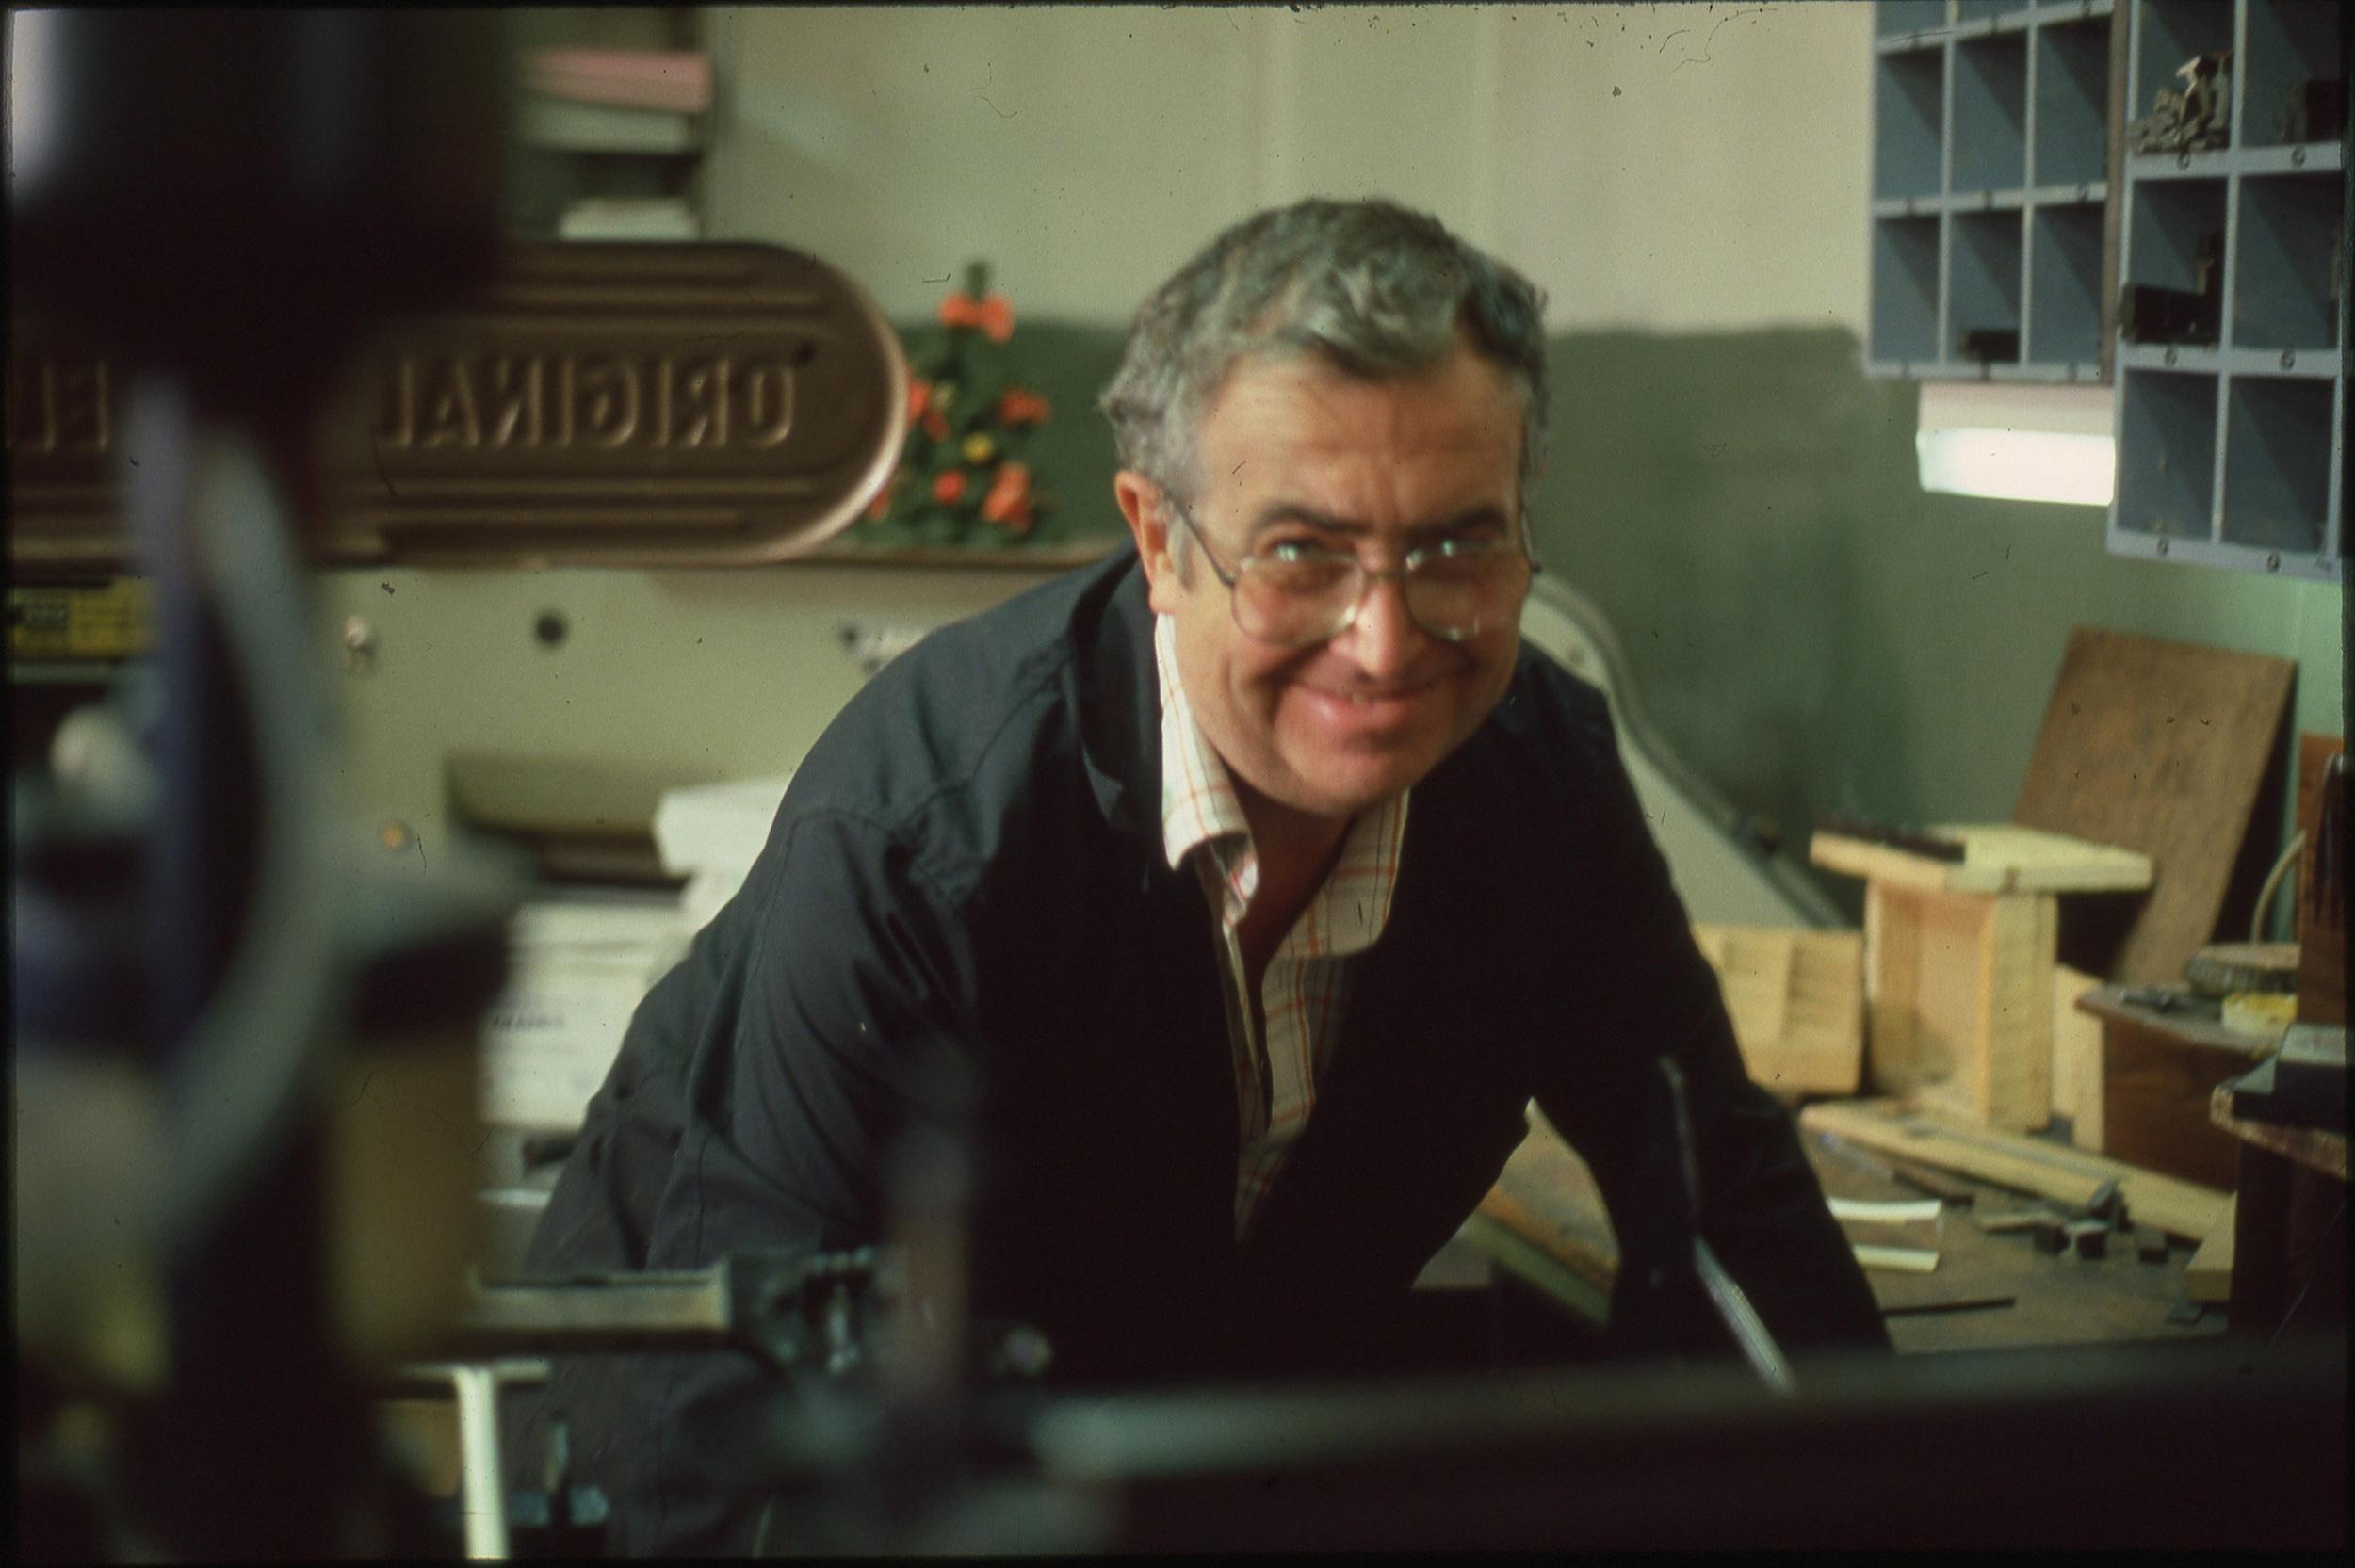 Mario Ravizzotti